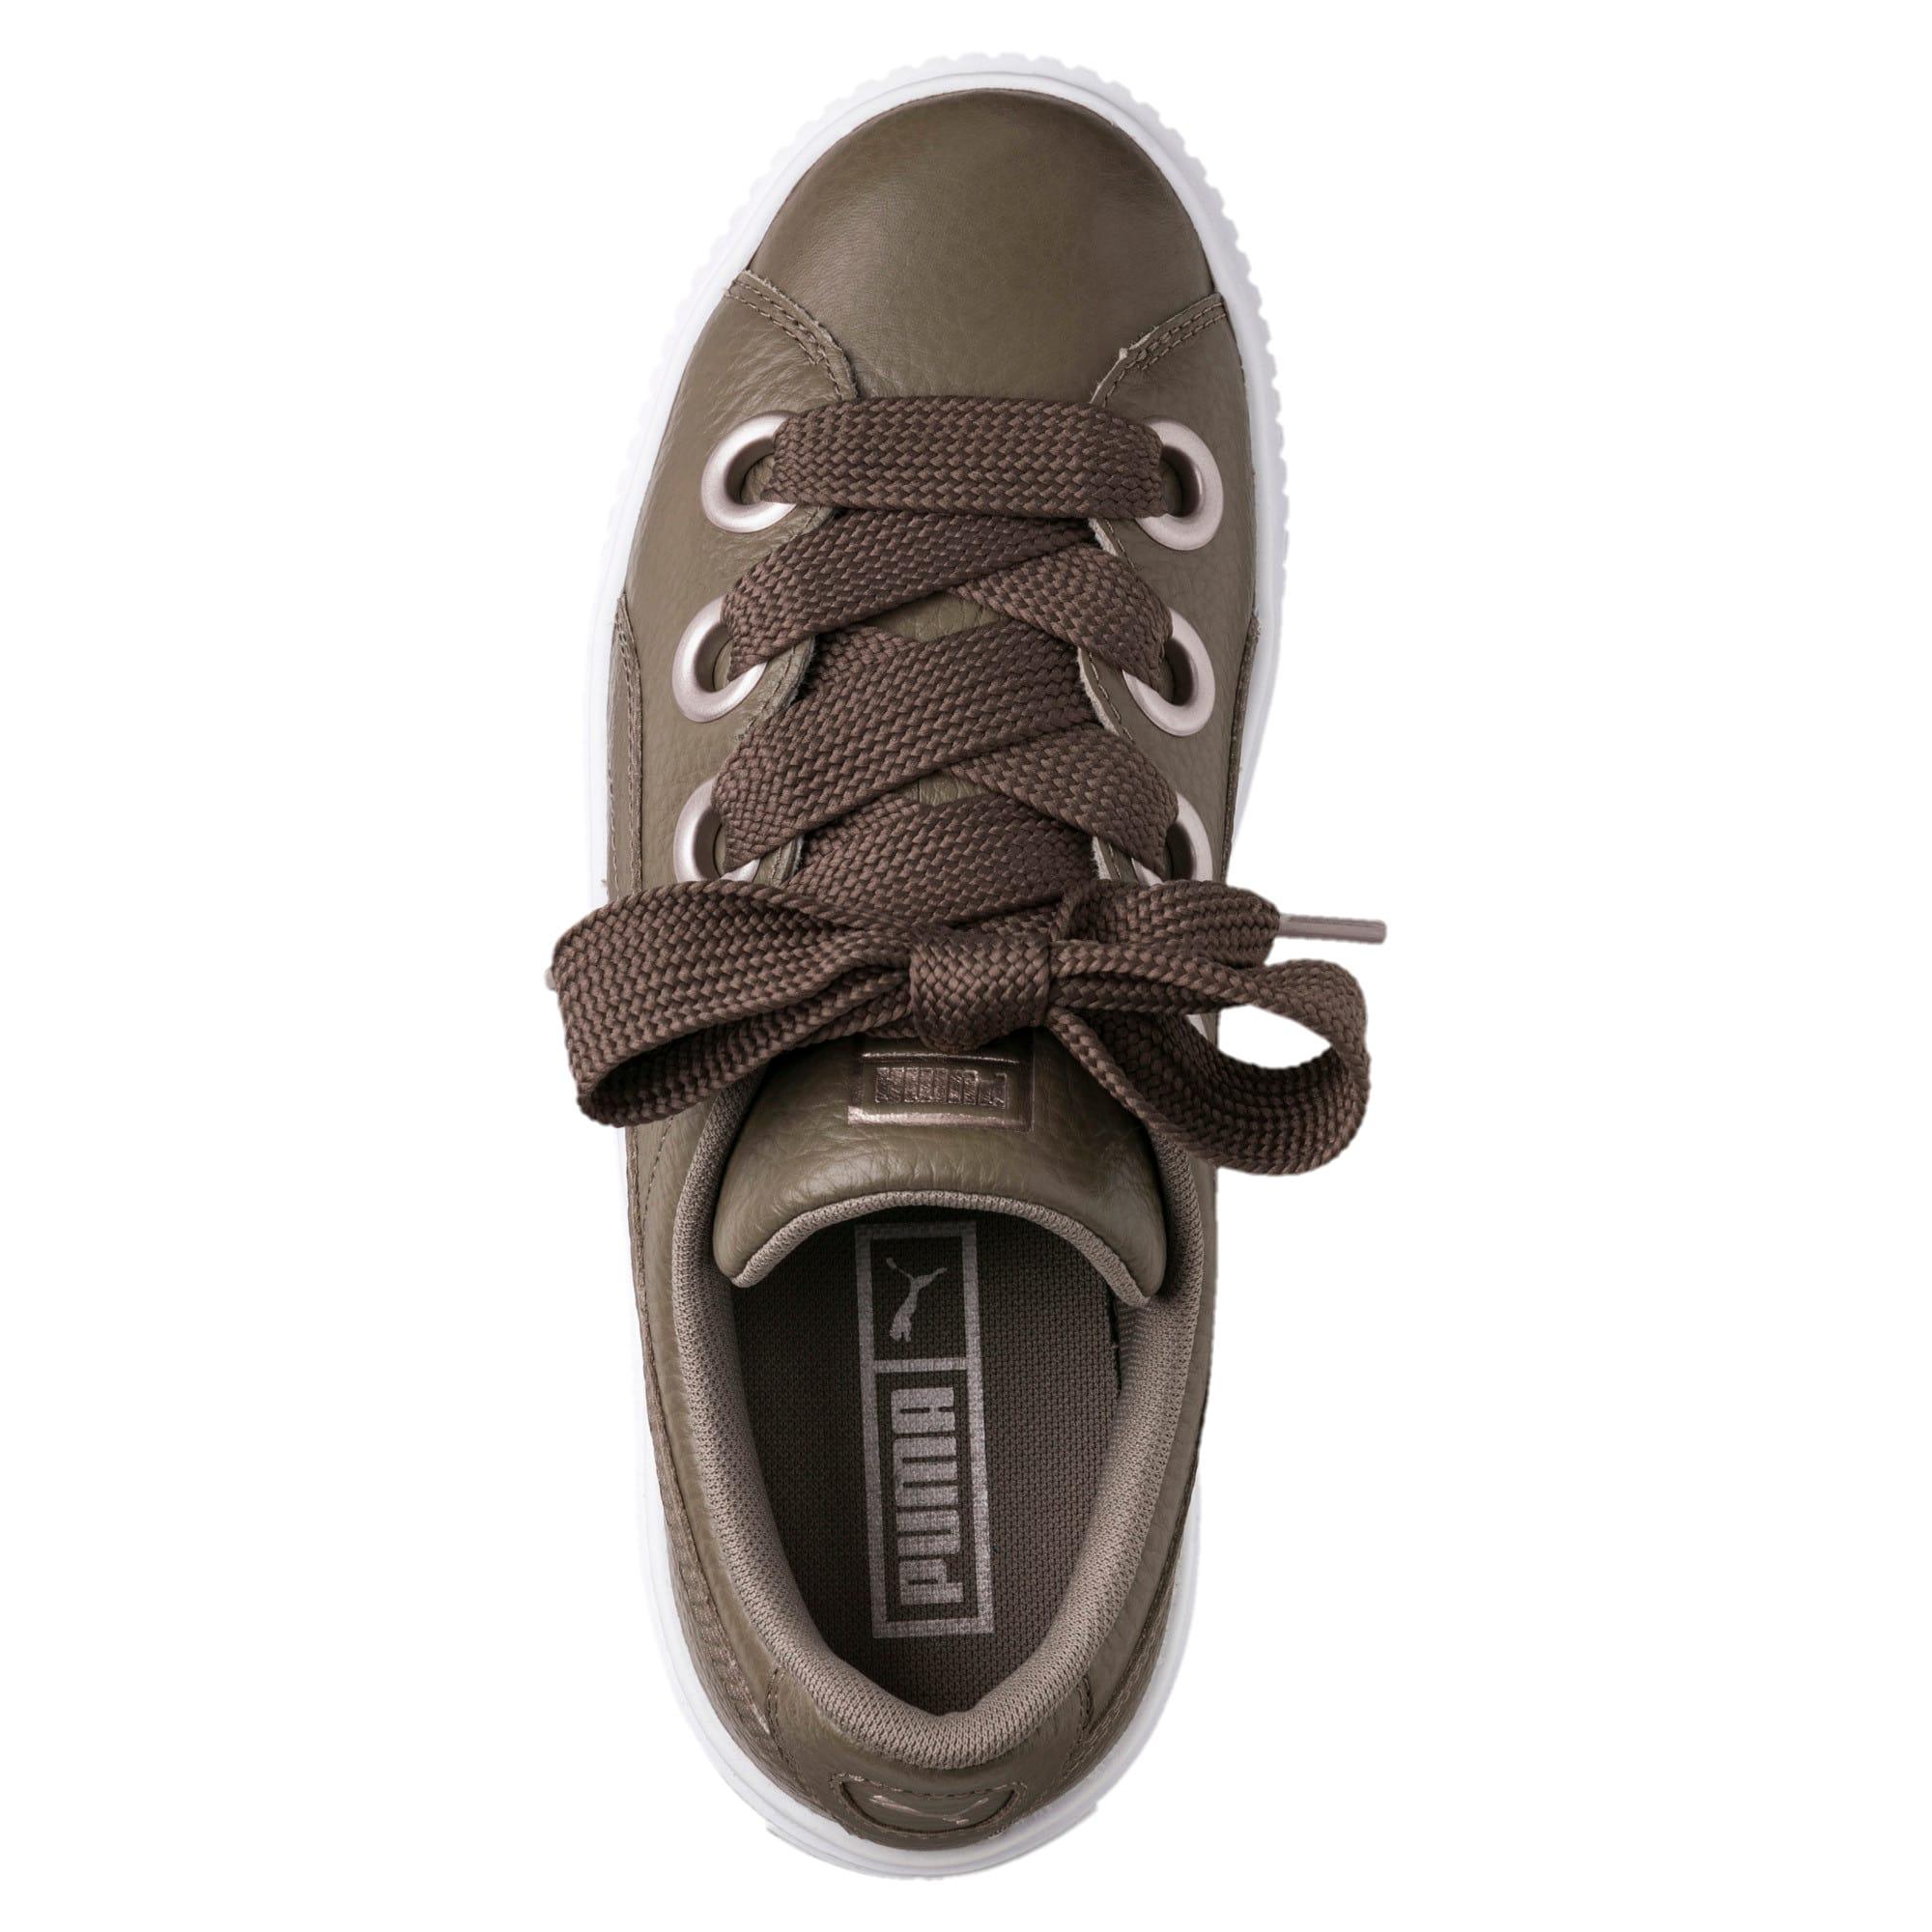 Thumbnail 5 of Platform Kiss Leather Women's Sneakers, Bungee Cord, medium